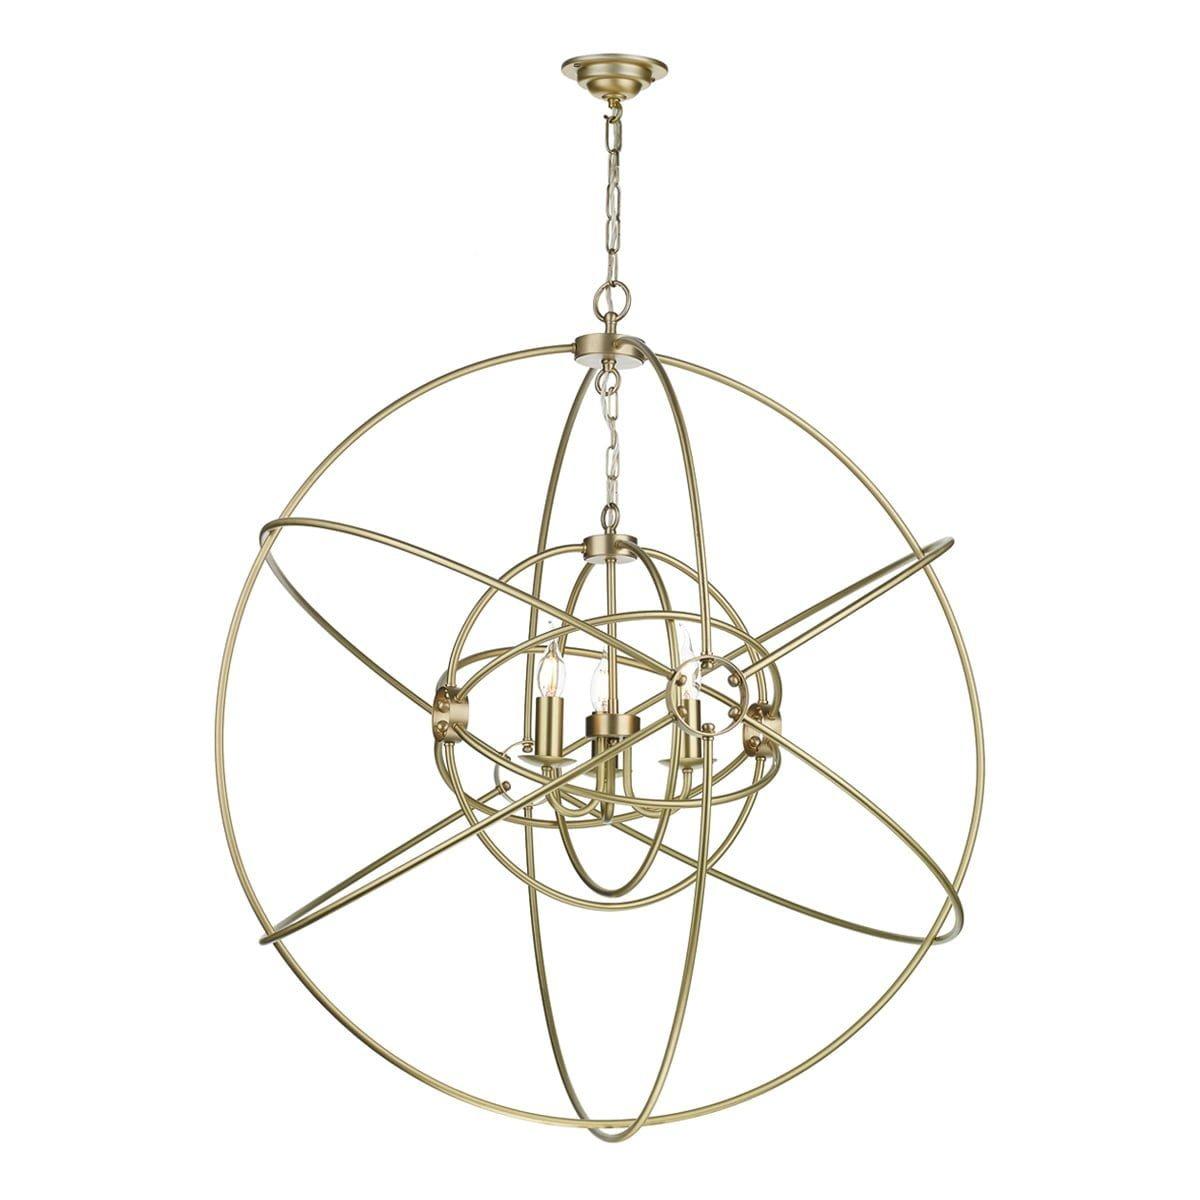 David Hunt Lighting ORB8840- Orb 3lt Single Pendant, Brushed Brass